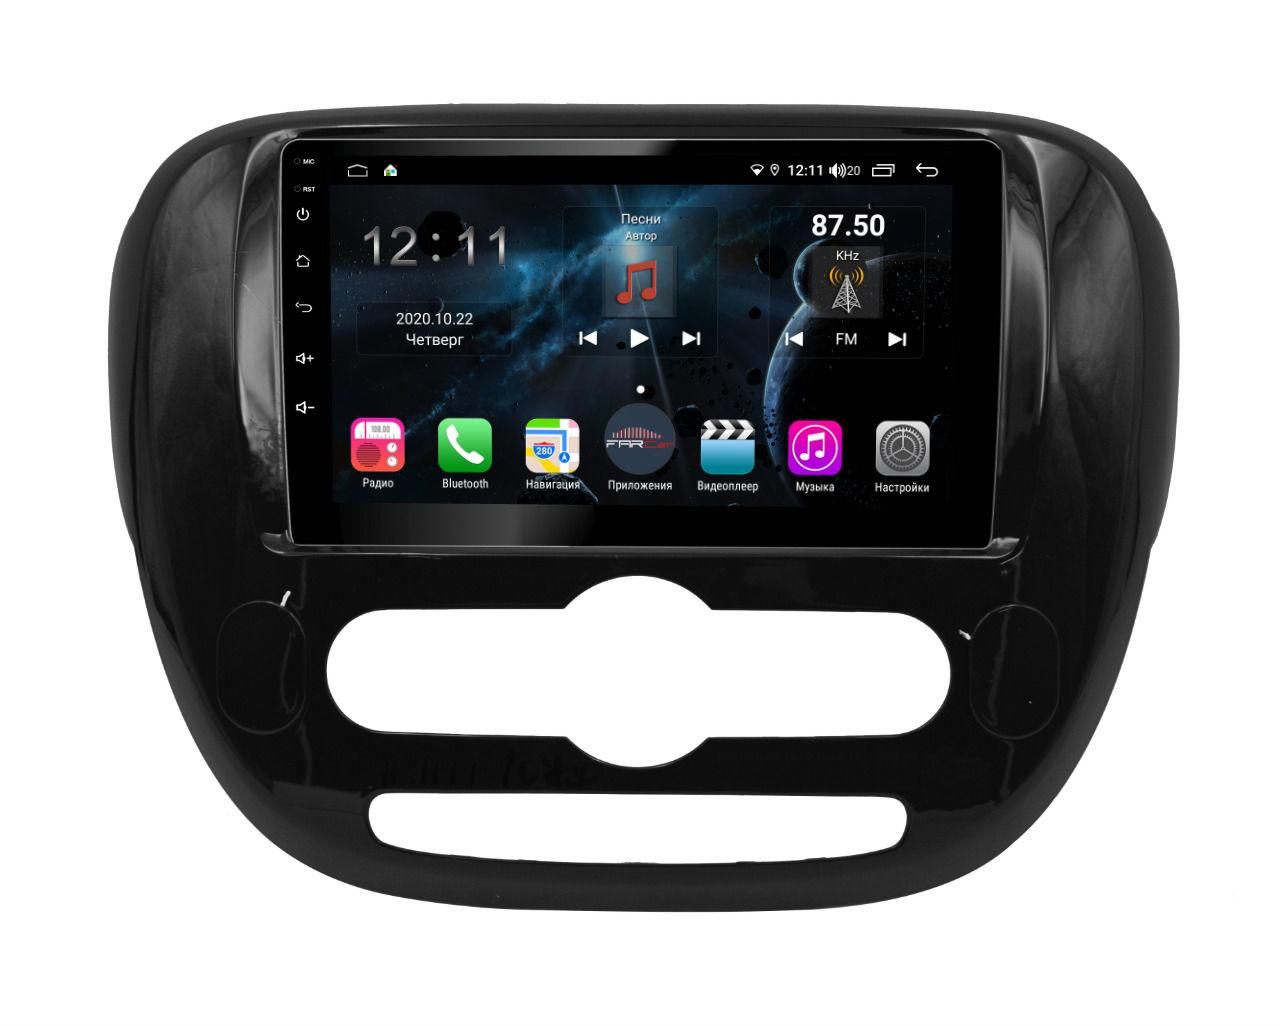 Штатная магнитола FarCar s400 для KIA Soul на Android (H526R) (+ Камера заднего вида в подарок!)